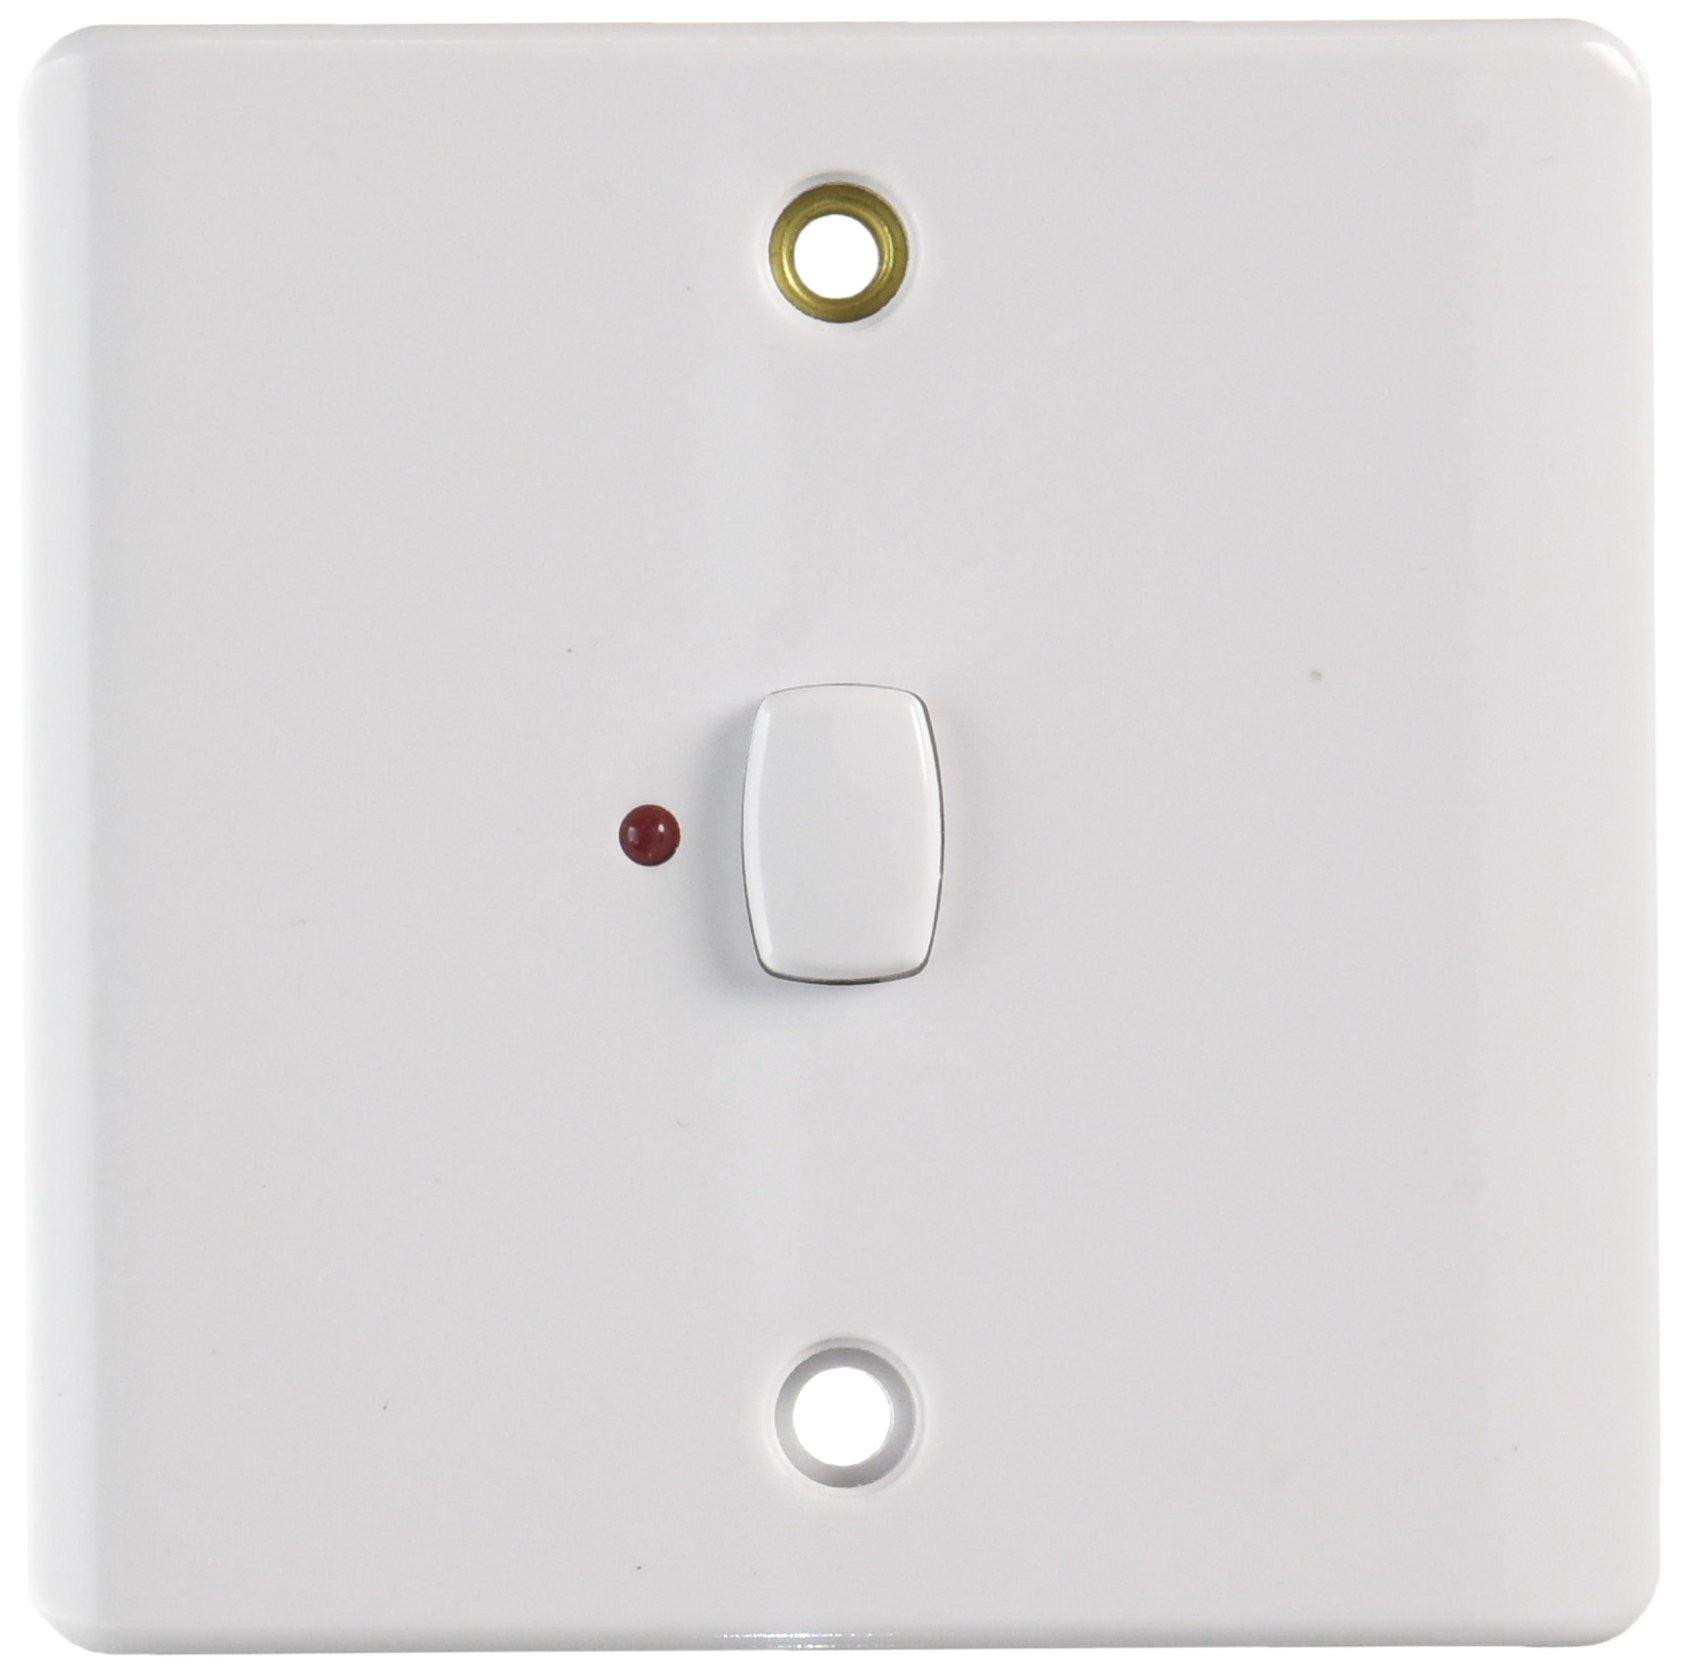 Smart Light Switch: Amazon.co.uk